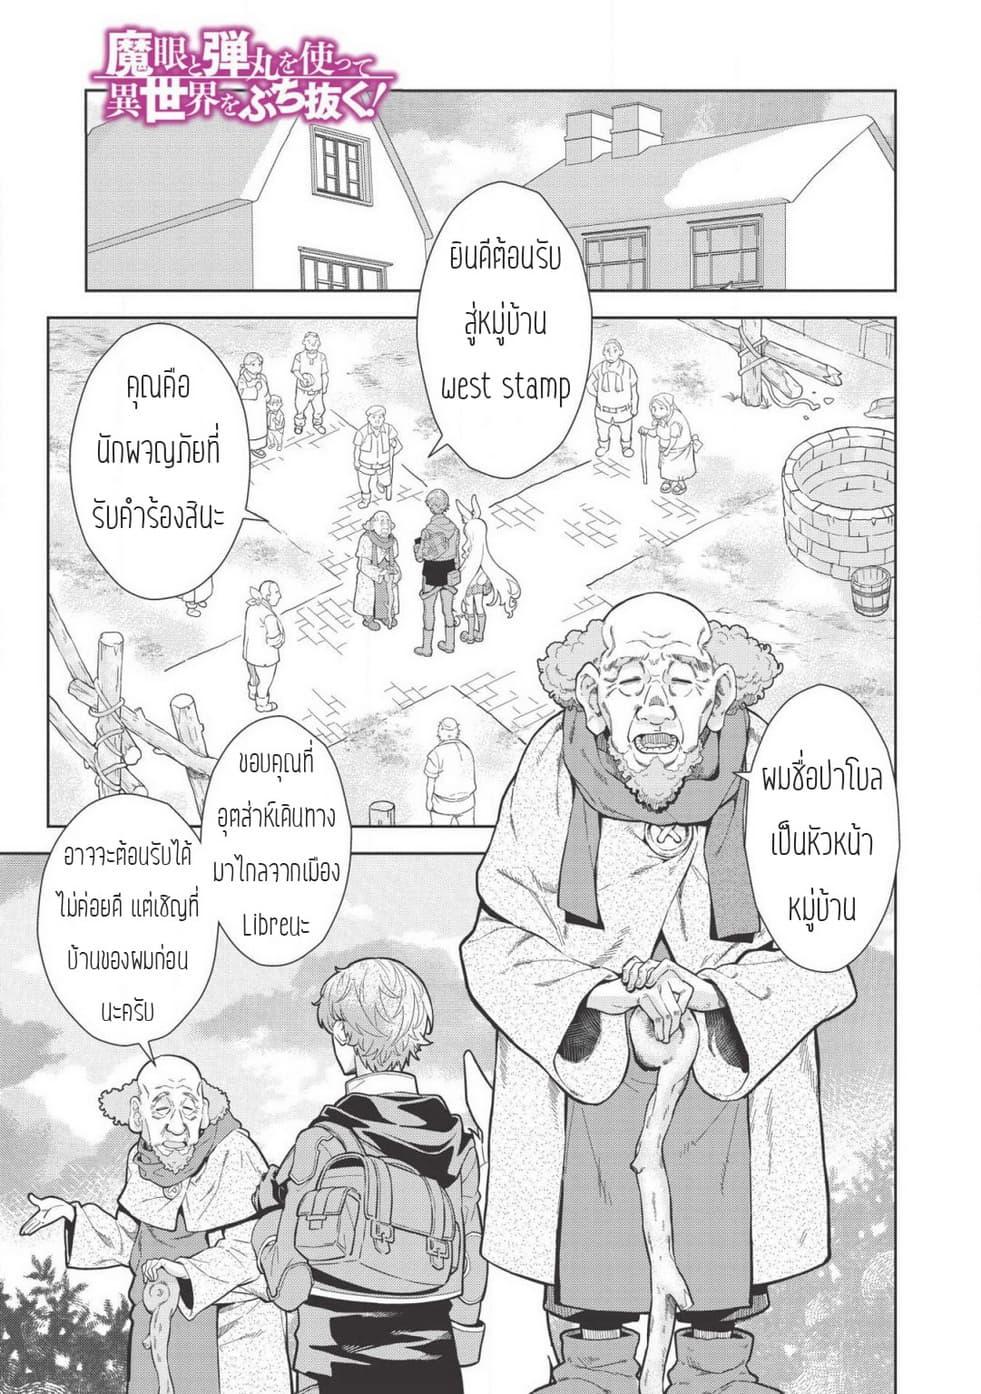 Magan to Dangan o Tsukatte Isekai o Buchinuku!-ตอนที่ 9.1